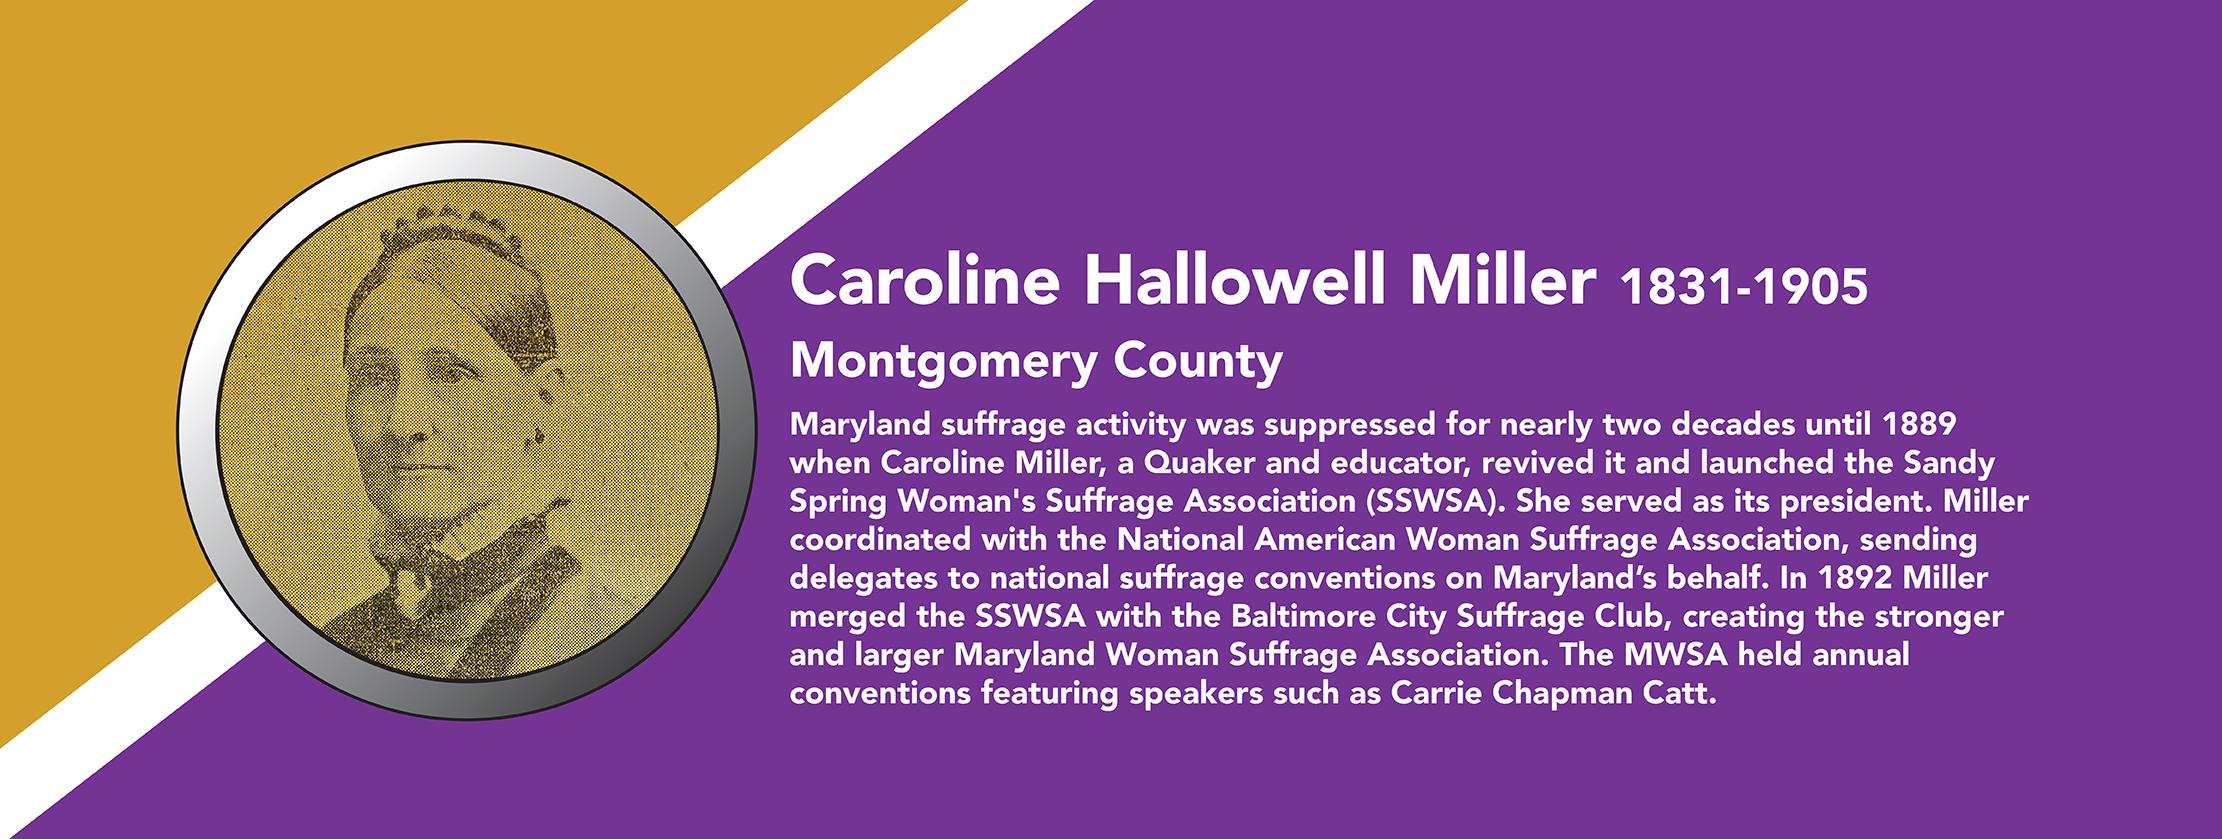 Caroline Hallowell Miller